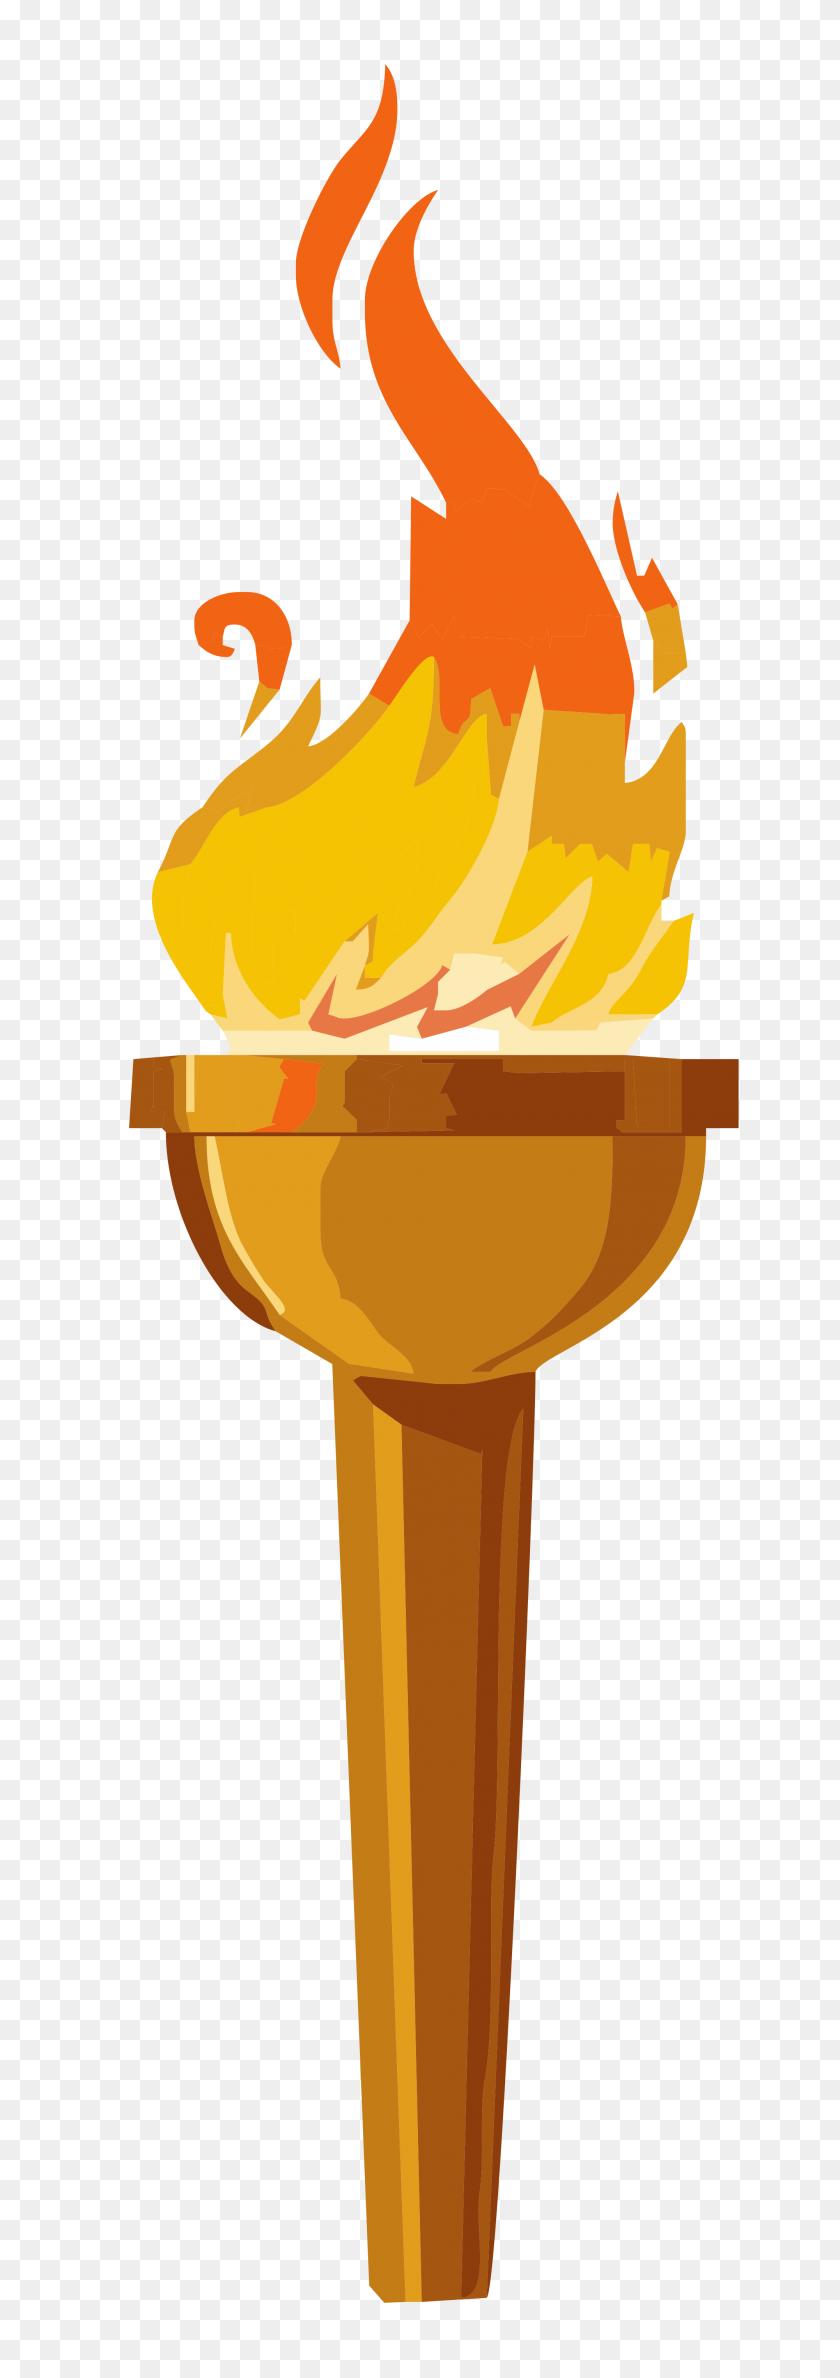 2000x5944 Ncaee Region Conference Teachers, Pass The Torch! Always - Region Clipart